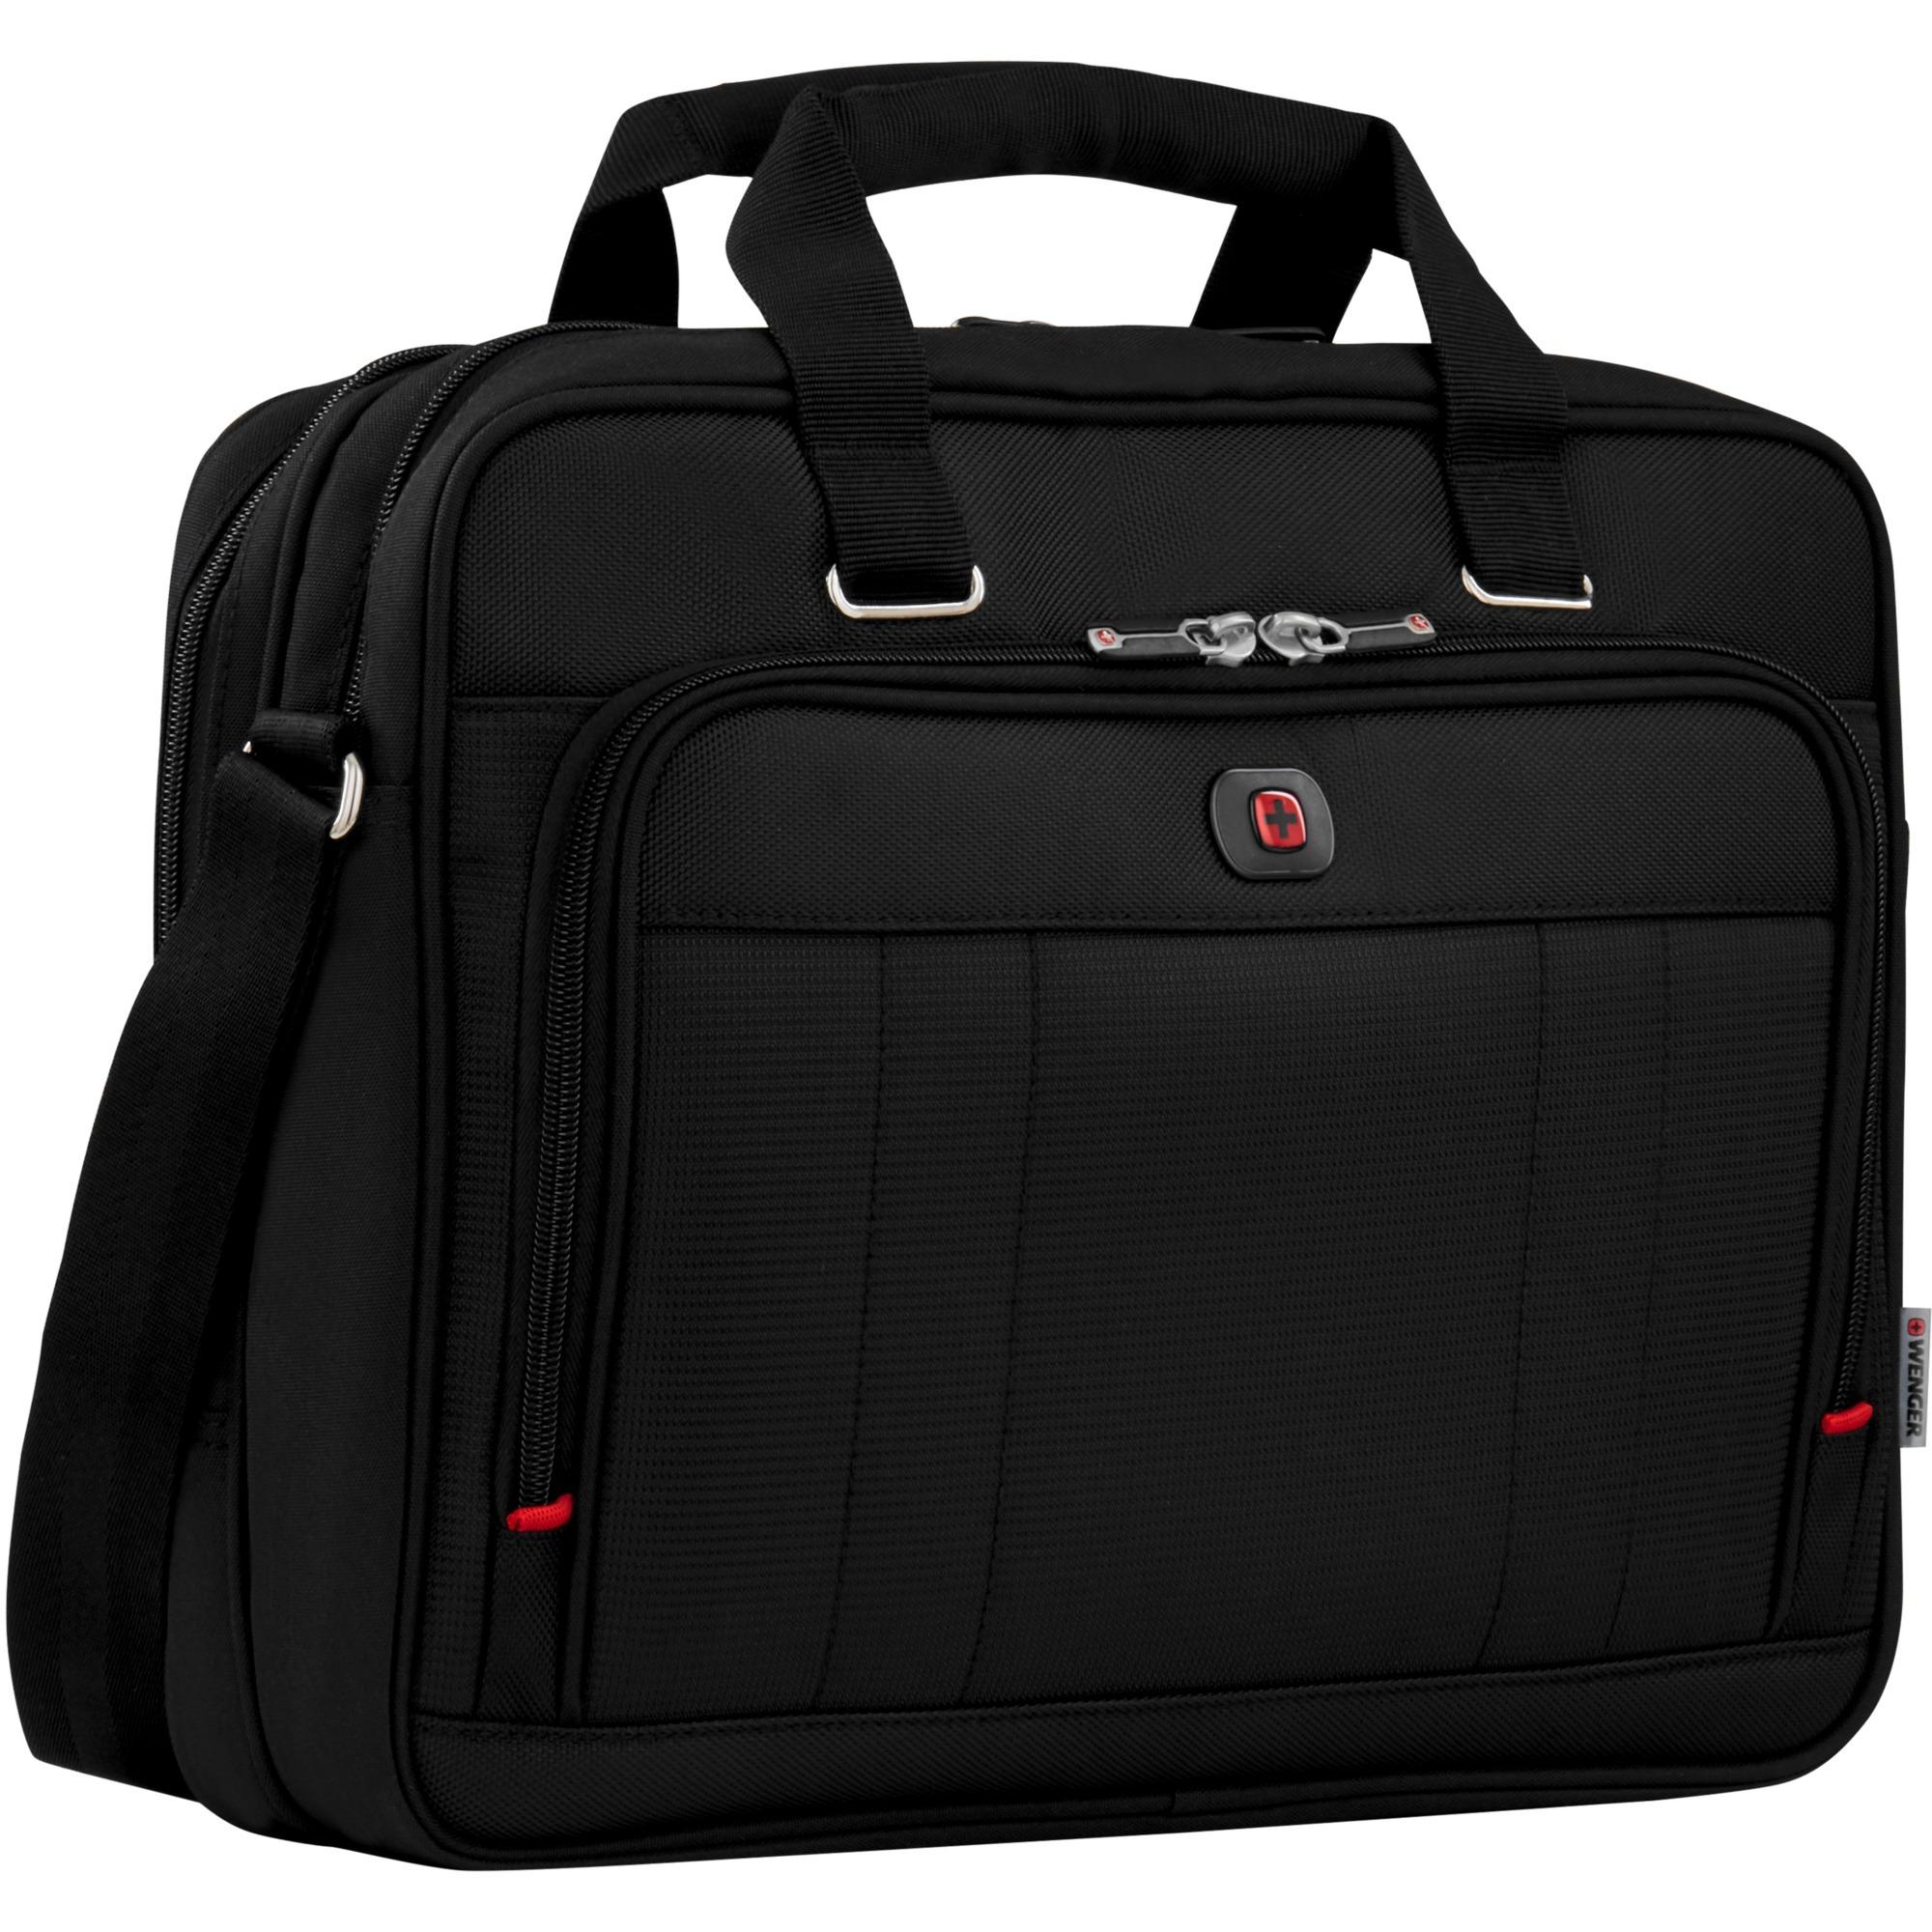 "600645 16"" Maletín Negro maletines para portátil, Bolsa"